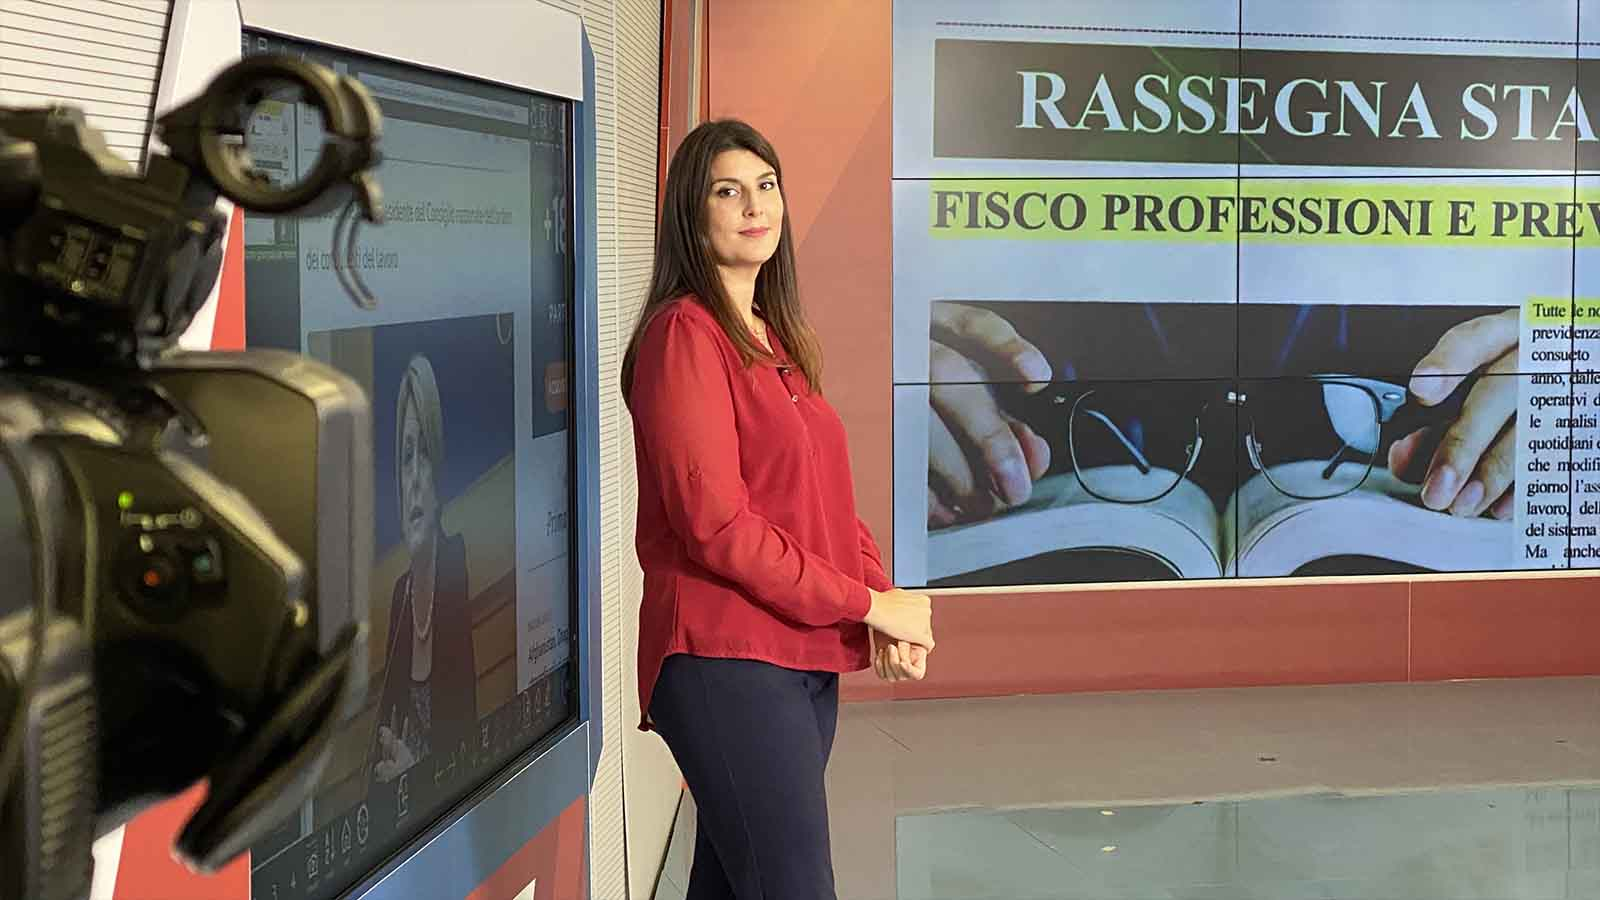 Rassegna Stampa -24.09.2021